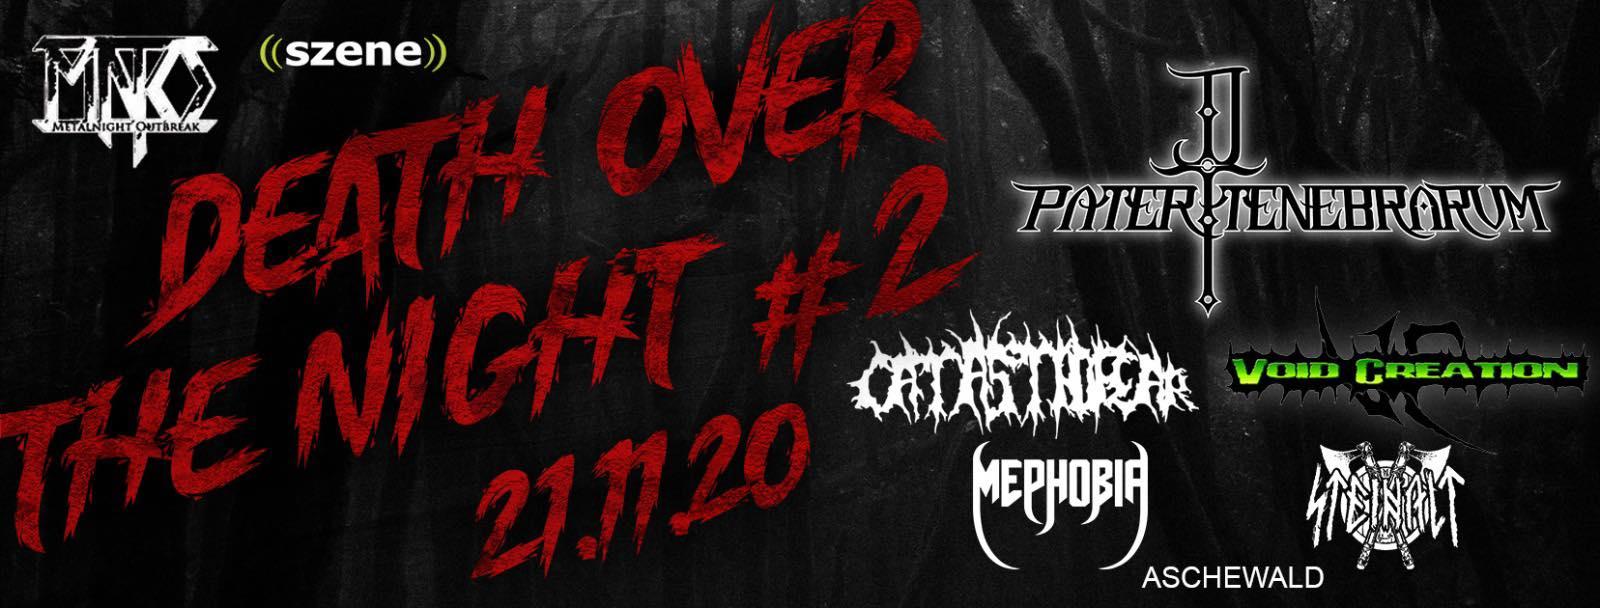 Death Over The Night #2 am 21. November 2020 @ Szene Wien.